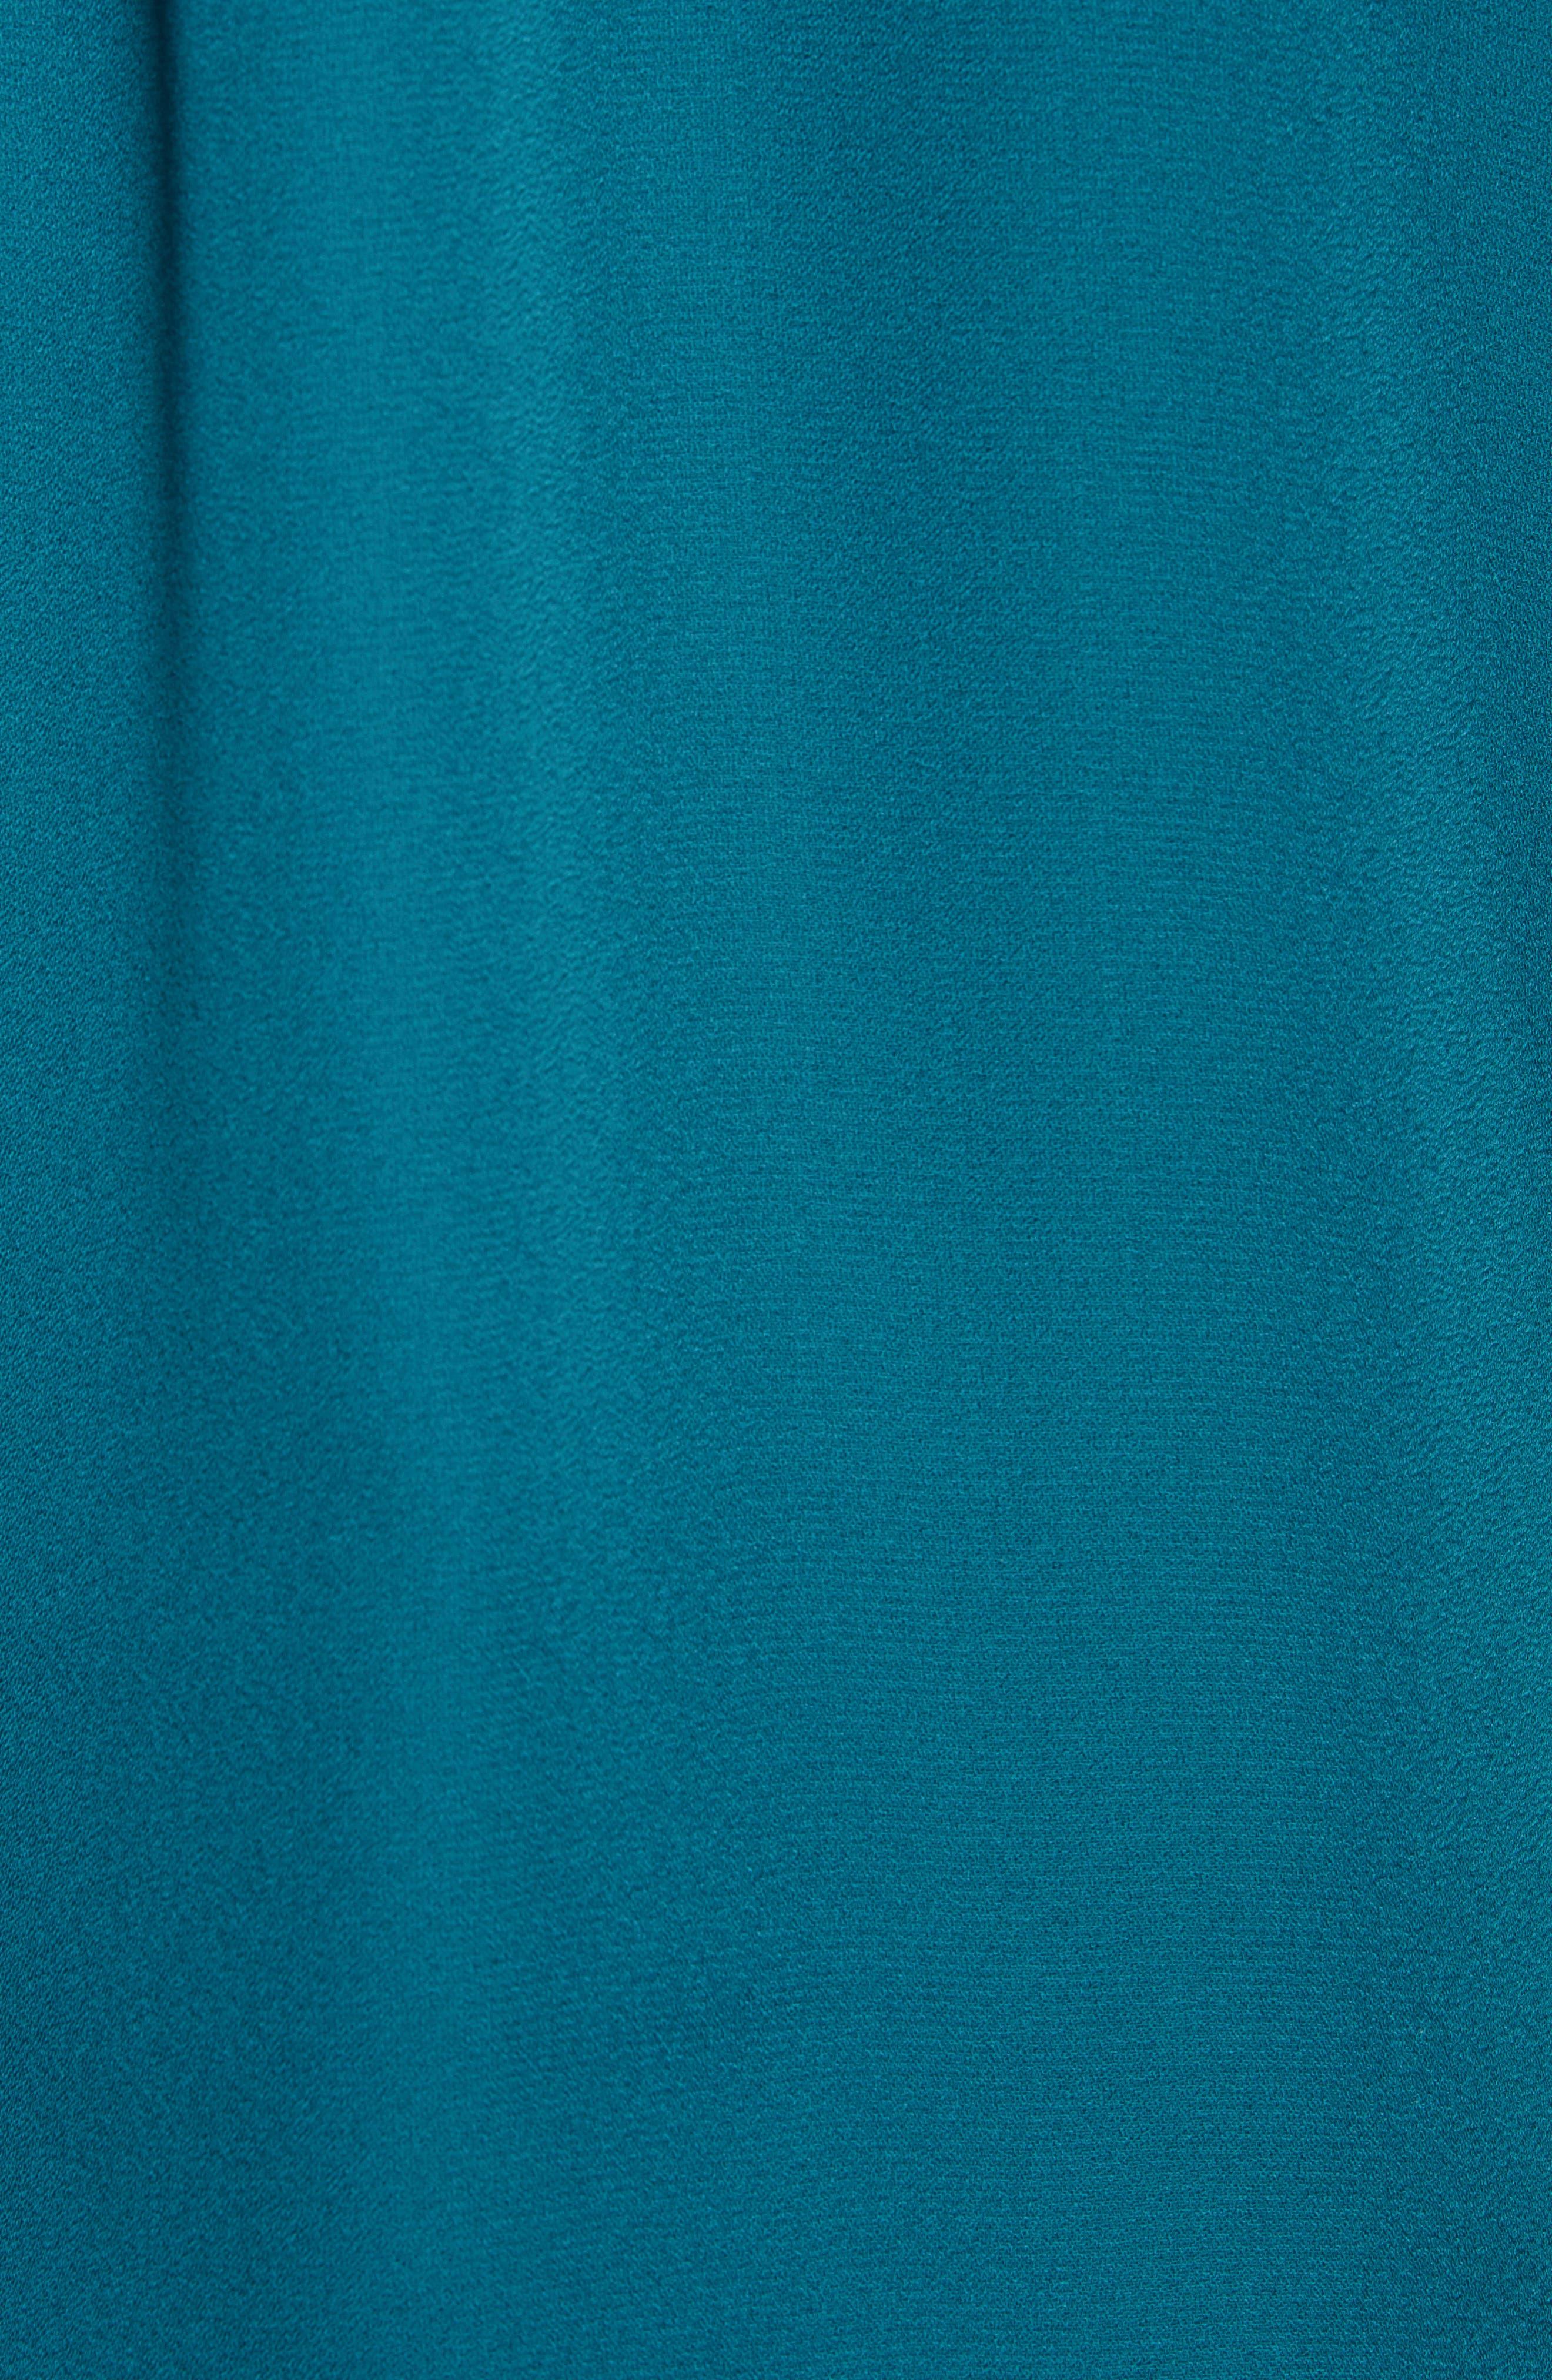 SOCIALITE, Lace Trim Camisole Top, Alternate thumbnail 5, color, DARK TEAL